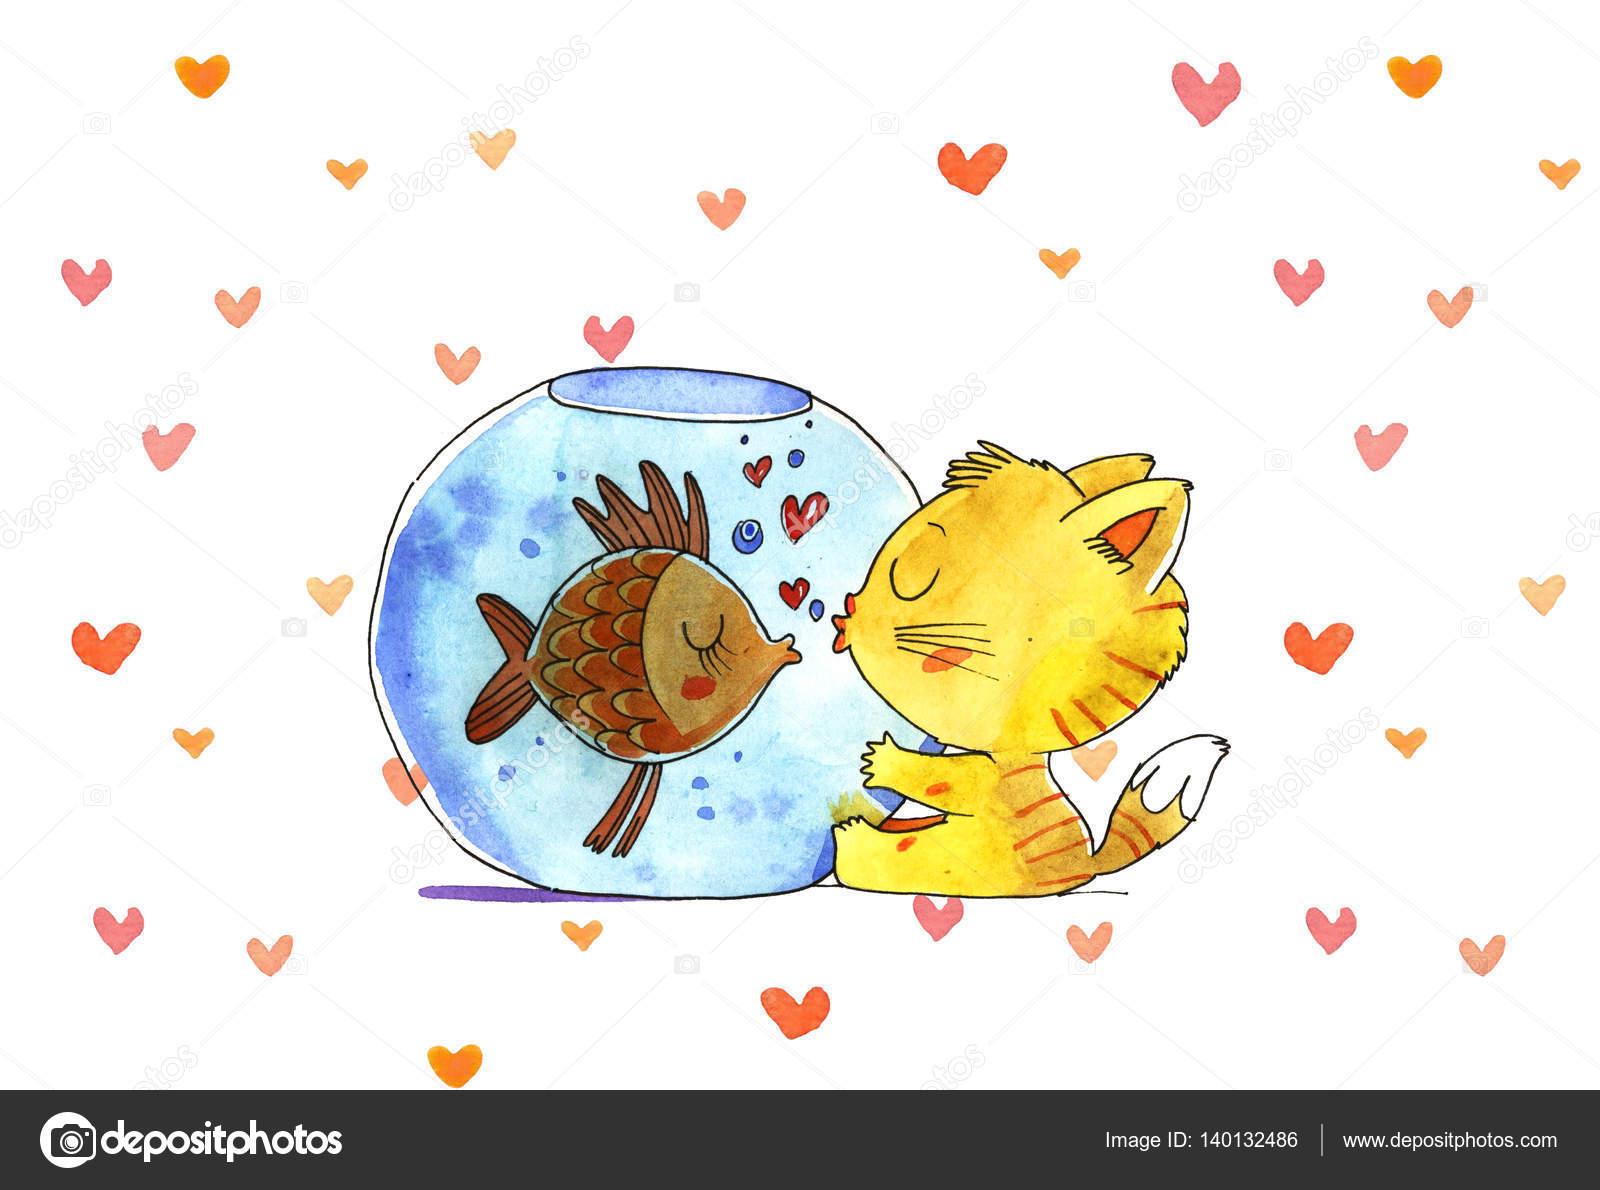 Download 51 Background Aquarium Cat Gratis Terbaik